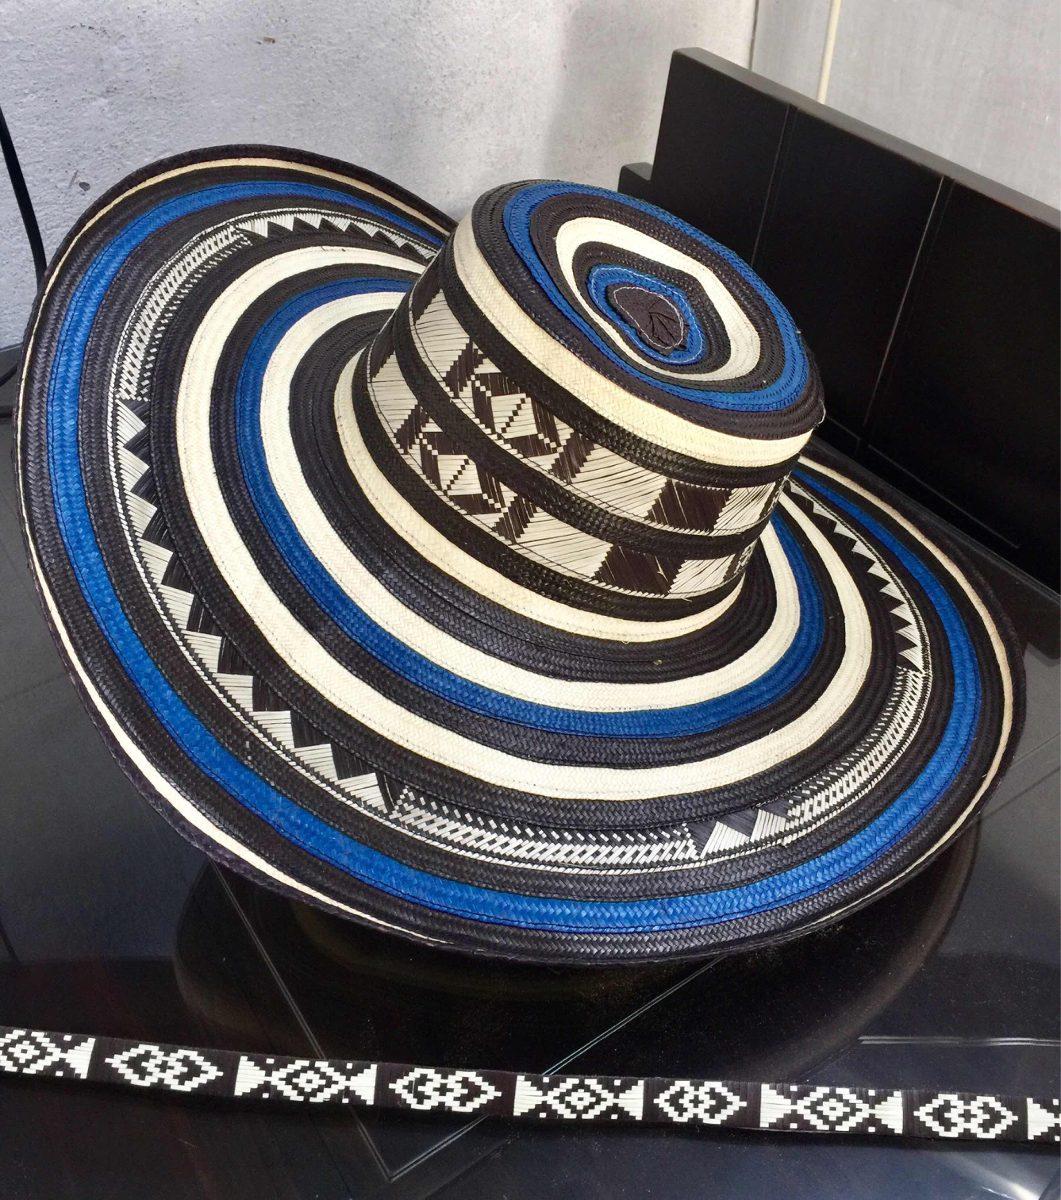 Sombrero vueltiao colombiano vueltas azul cinto cargando zoom jpg 1061x1200 Sombrero  vueltiao colombiano 17b8ab70c43